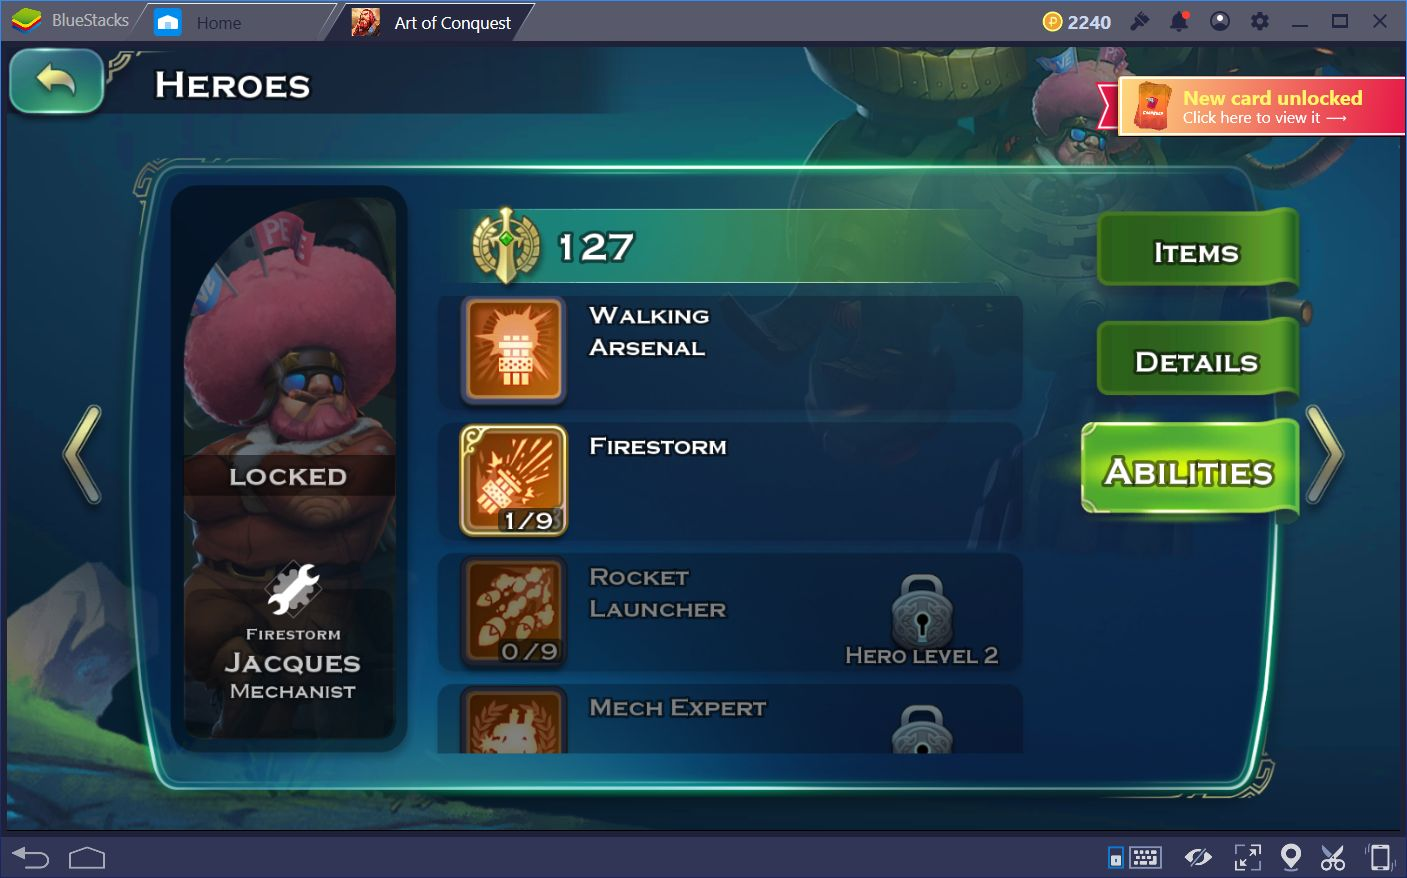 The Best Premium Heroes in Art of Conquest Pt. 2